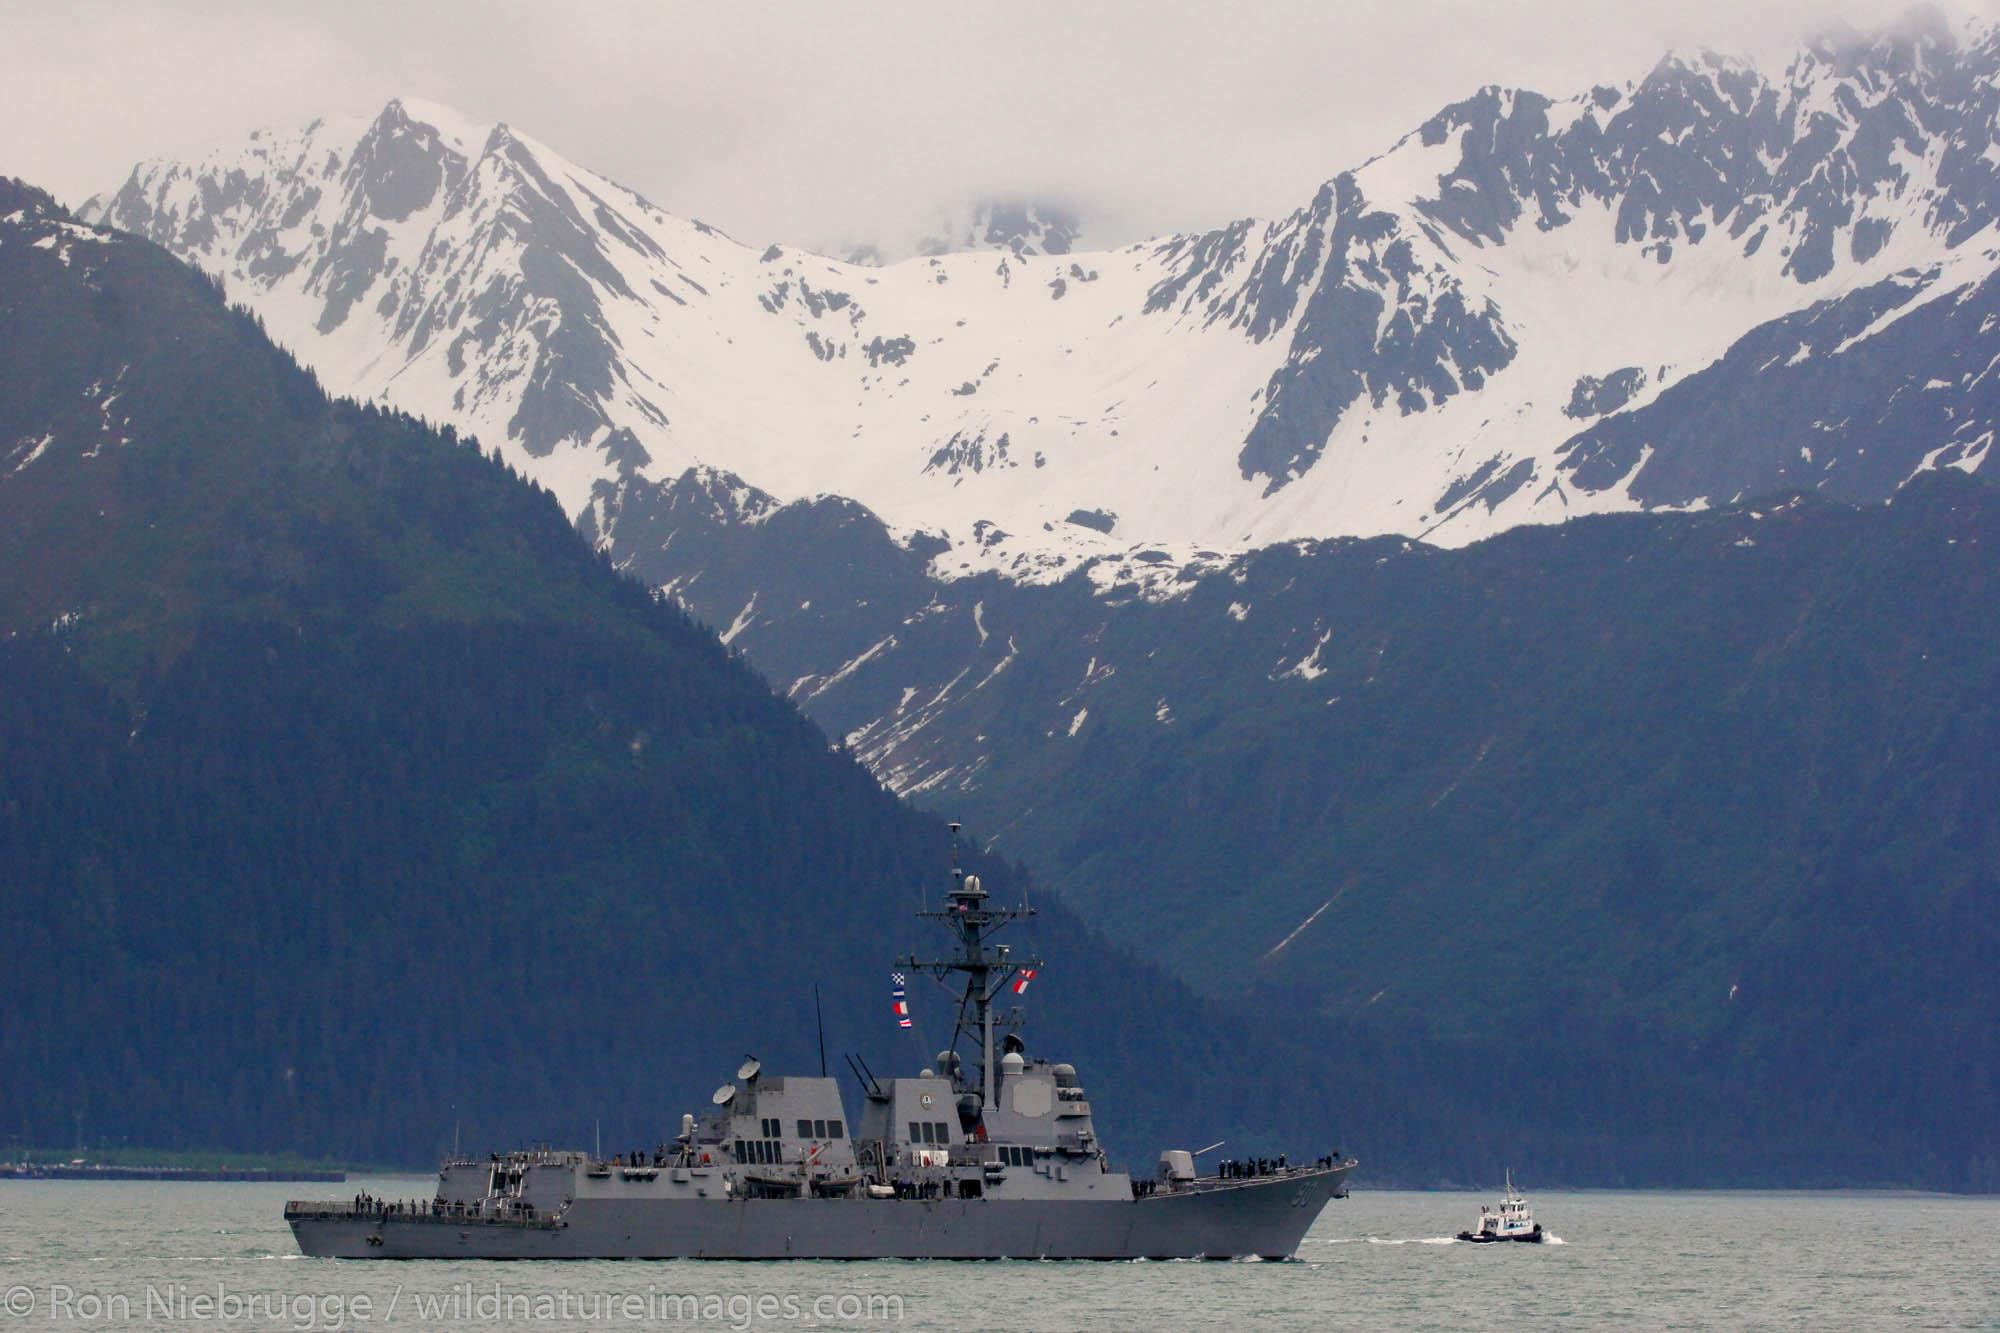 The U.S. Navy guided missile destroyer USS CHAFEE (DDG 90) leaves Resurrection Bay. Seward, Alaska.